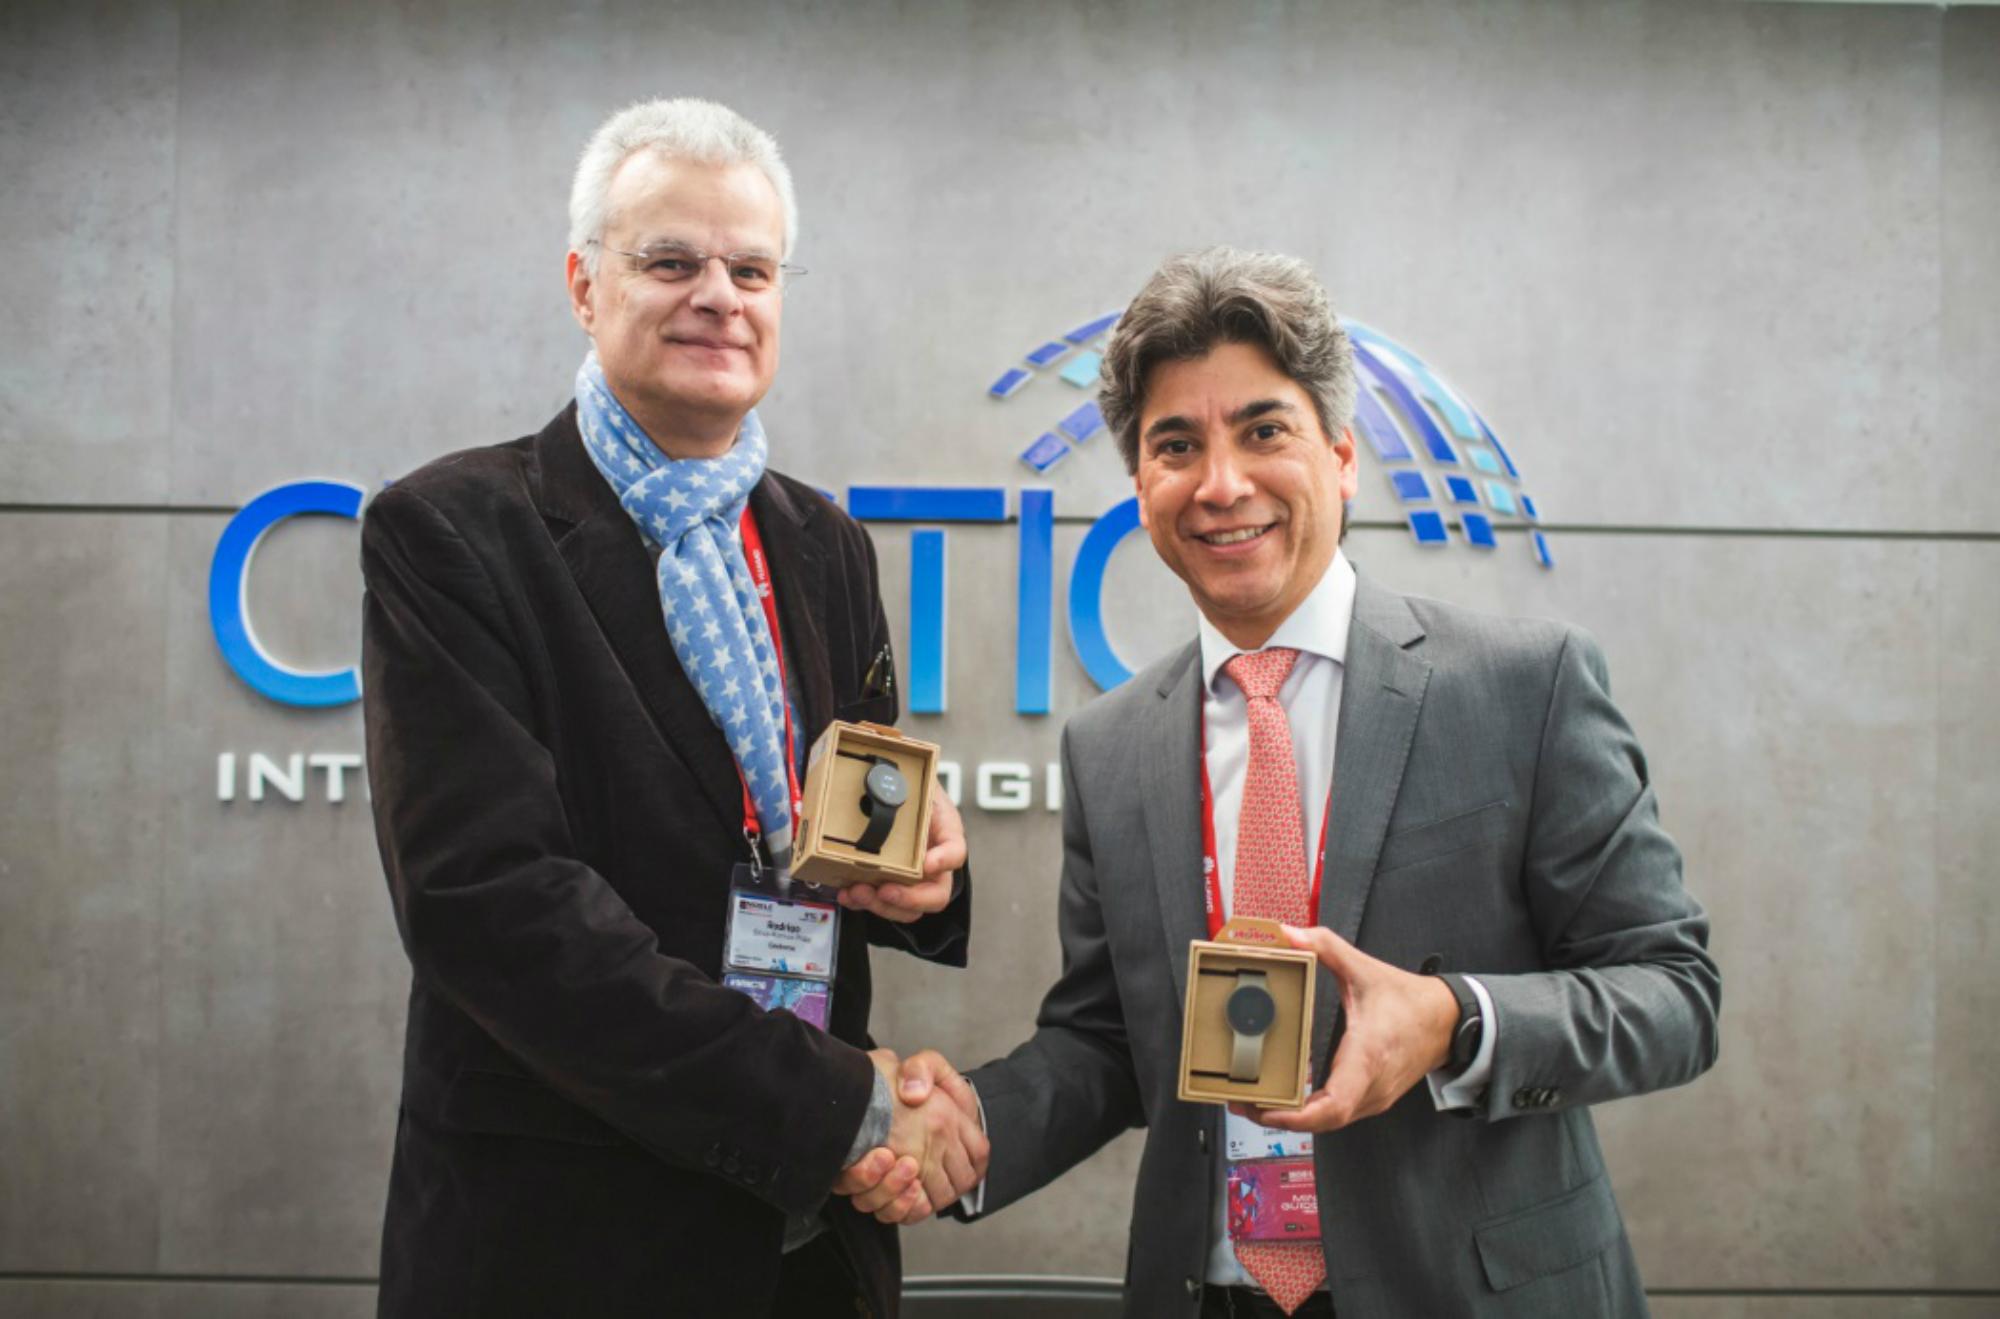 CELISTICS Rodrigo Silva Ramos_Chairman Geeksme junto a Antonio Belfort_Director General CELISTICS_alta